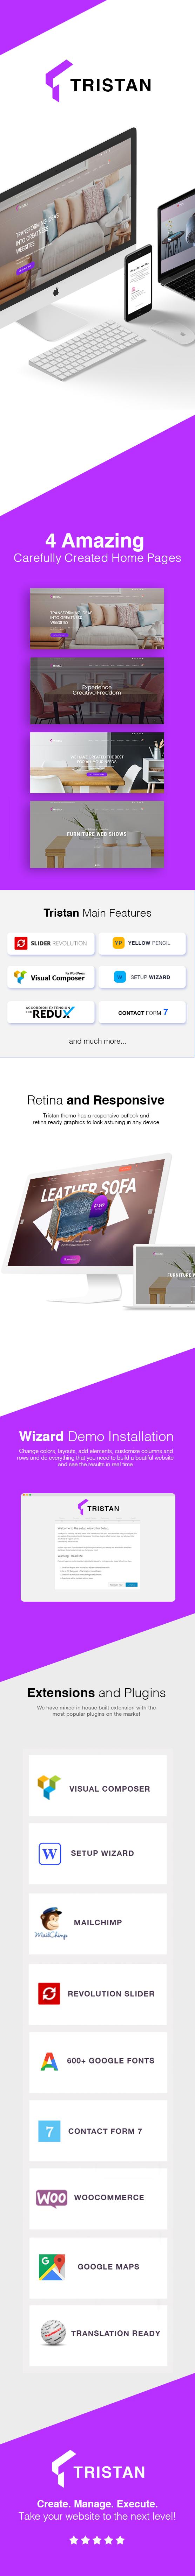 Tristan - Creative Furniture & Interior WordPress Theme - 1